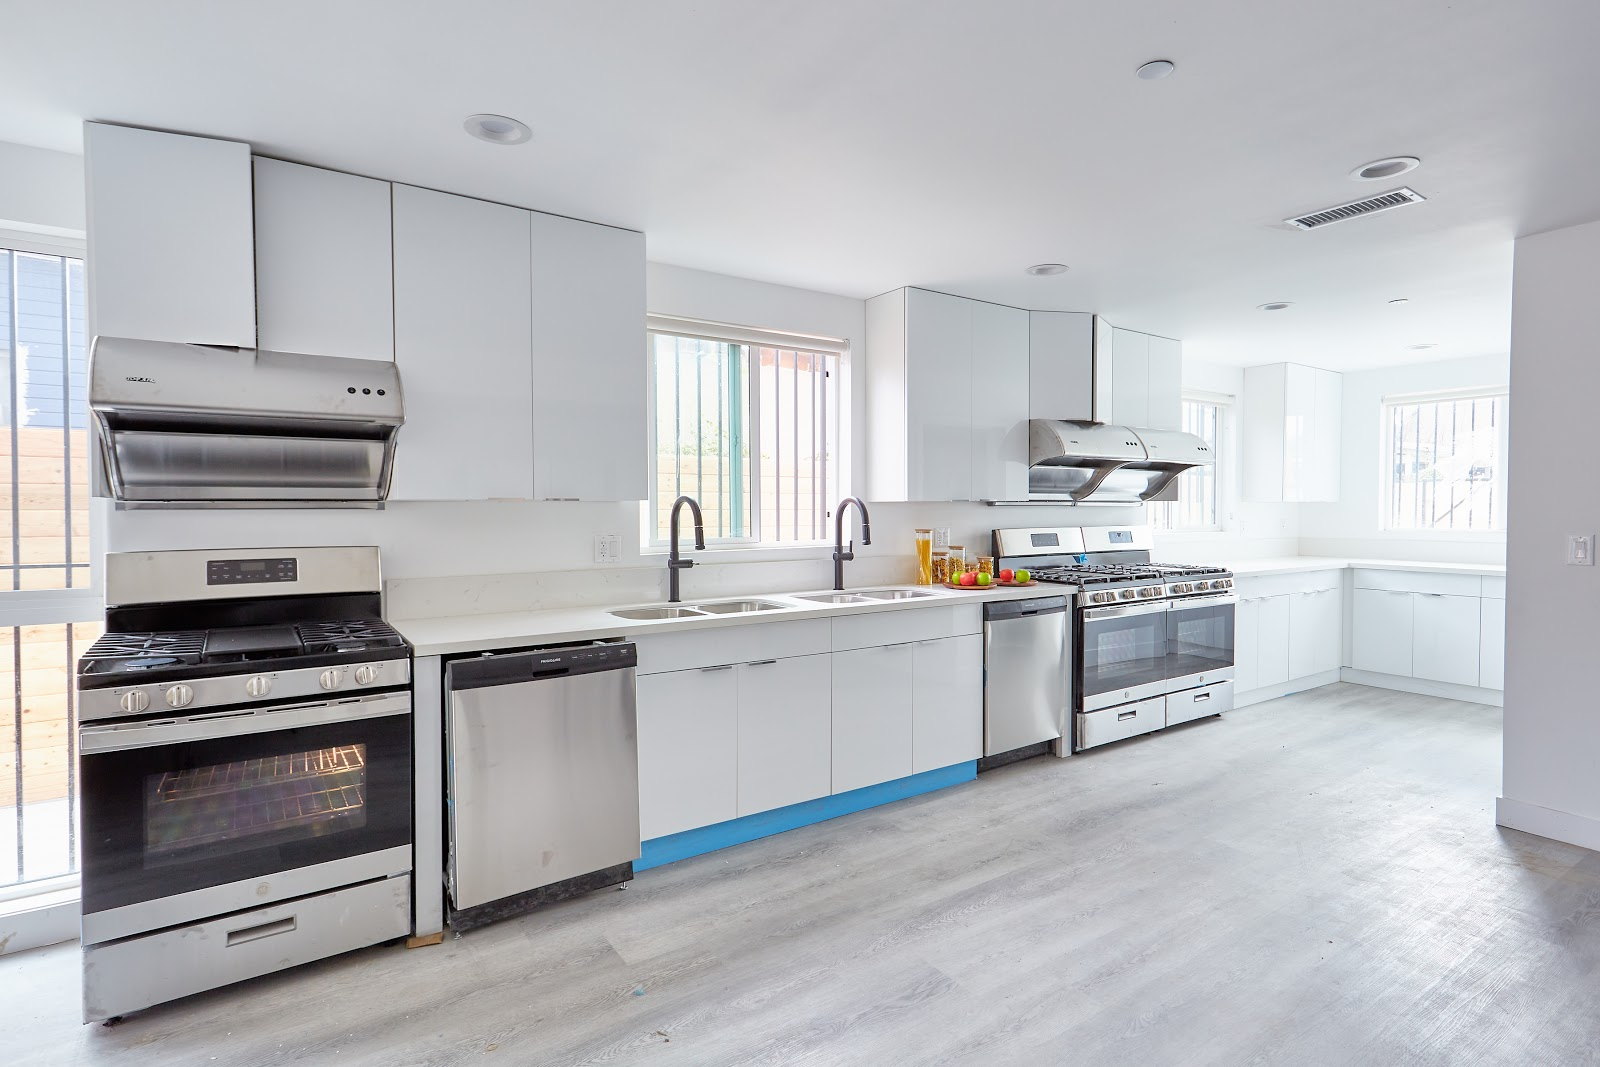 Tripalink bright modern kitchen with silver appliances